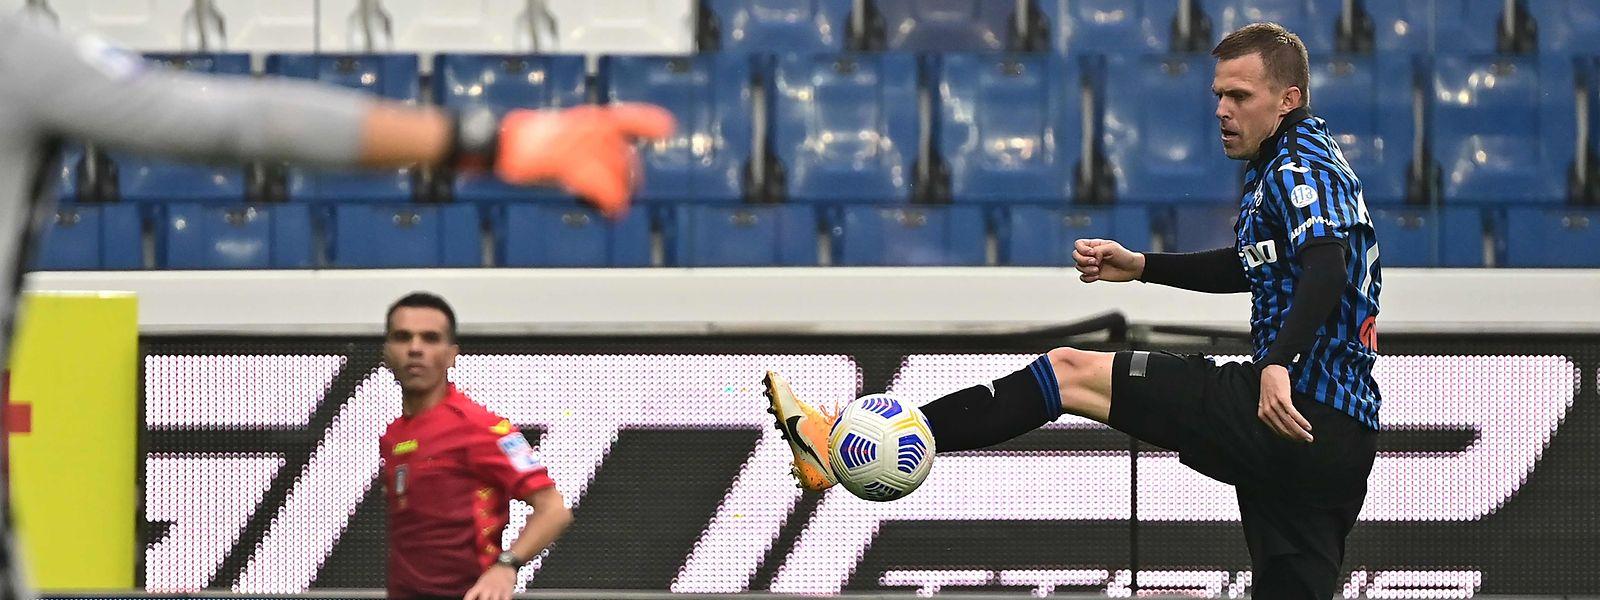 Josip Ilicic et l'Atalanta retrouvent la pelouse de l'Atleti Azzurri d'Italia stadium ce mardi soir.